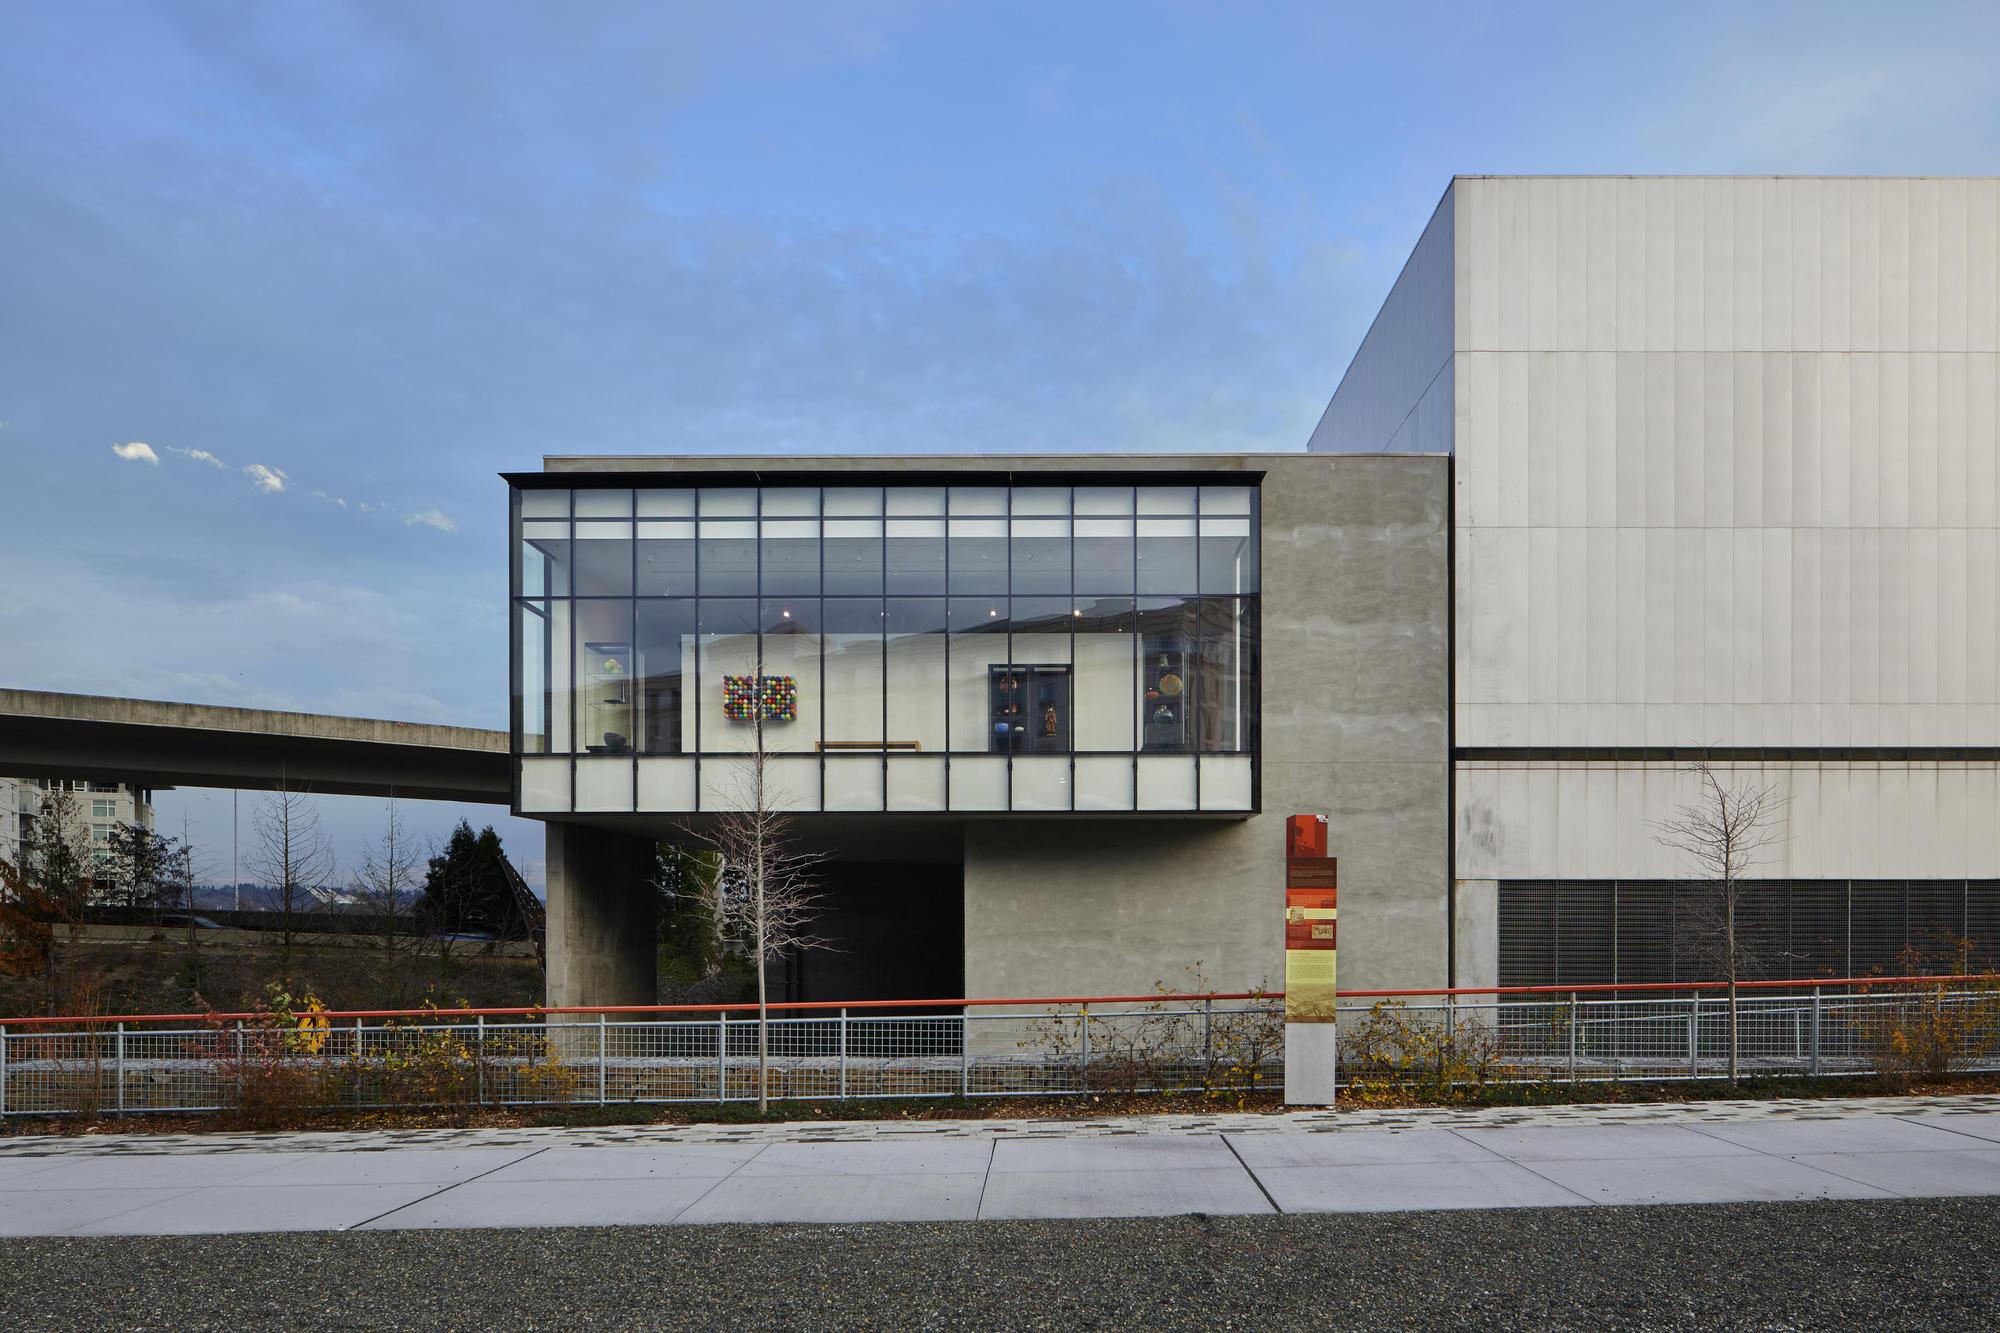 Tacoma Art Museum Benaroya Wing Olson Kundig - 4